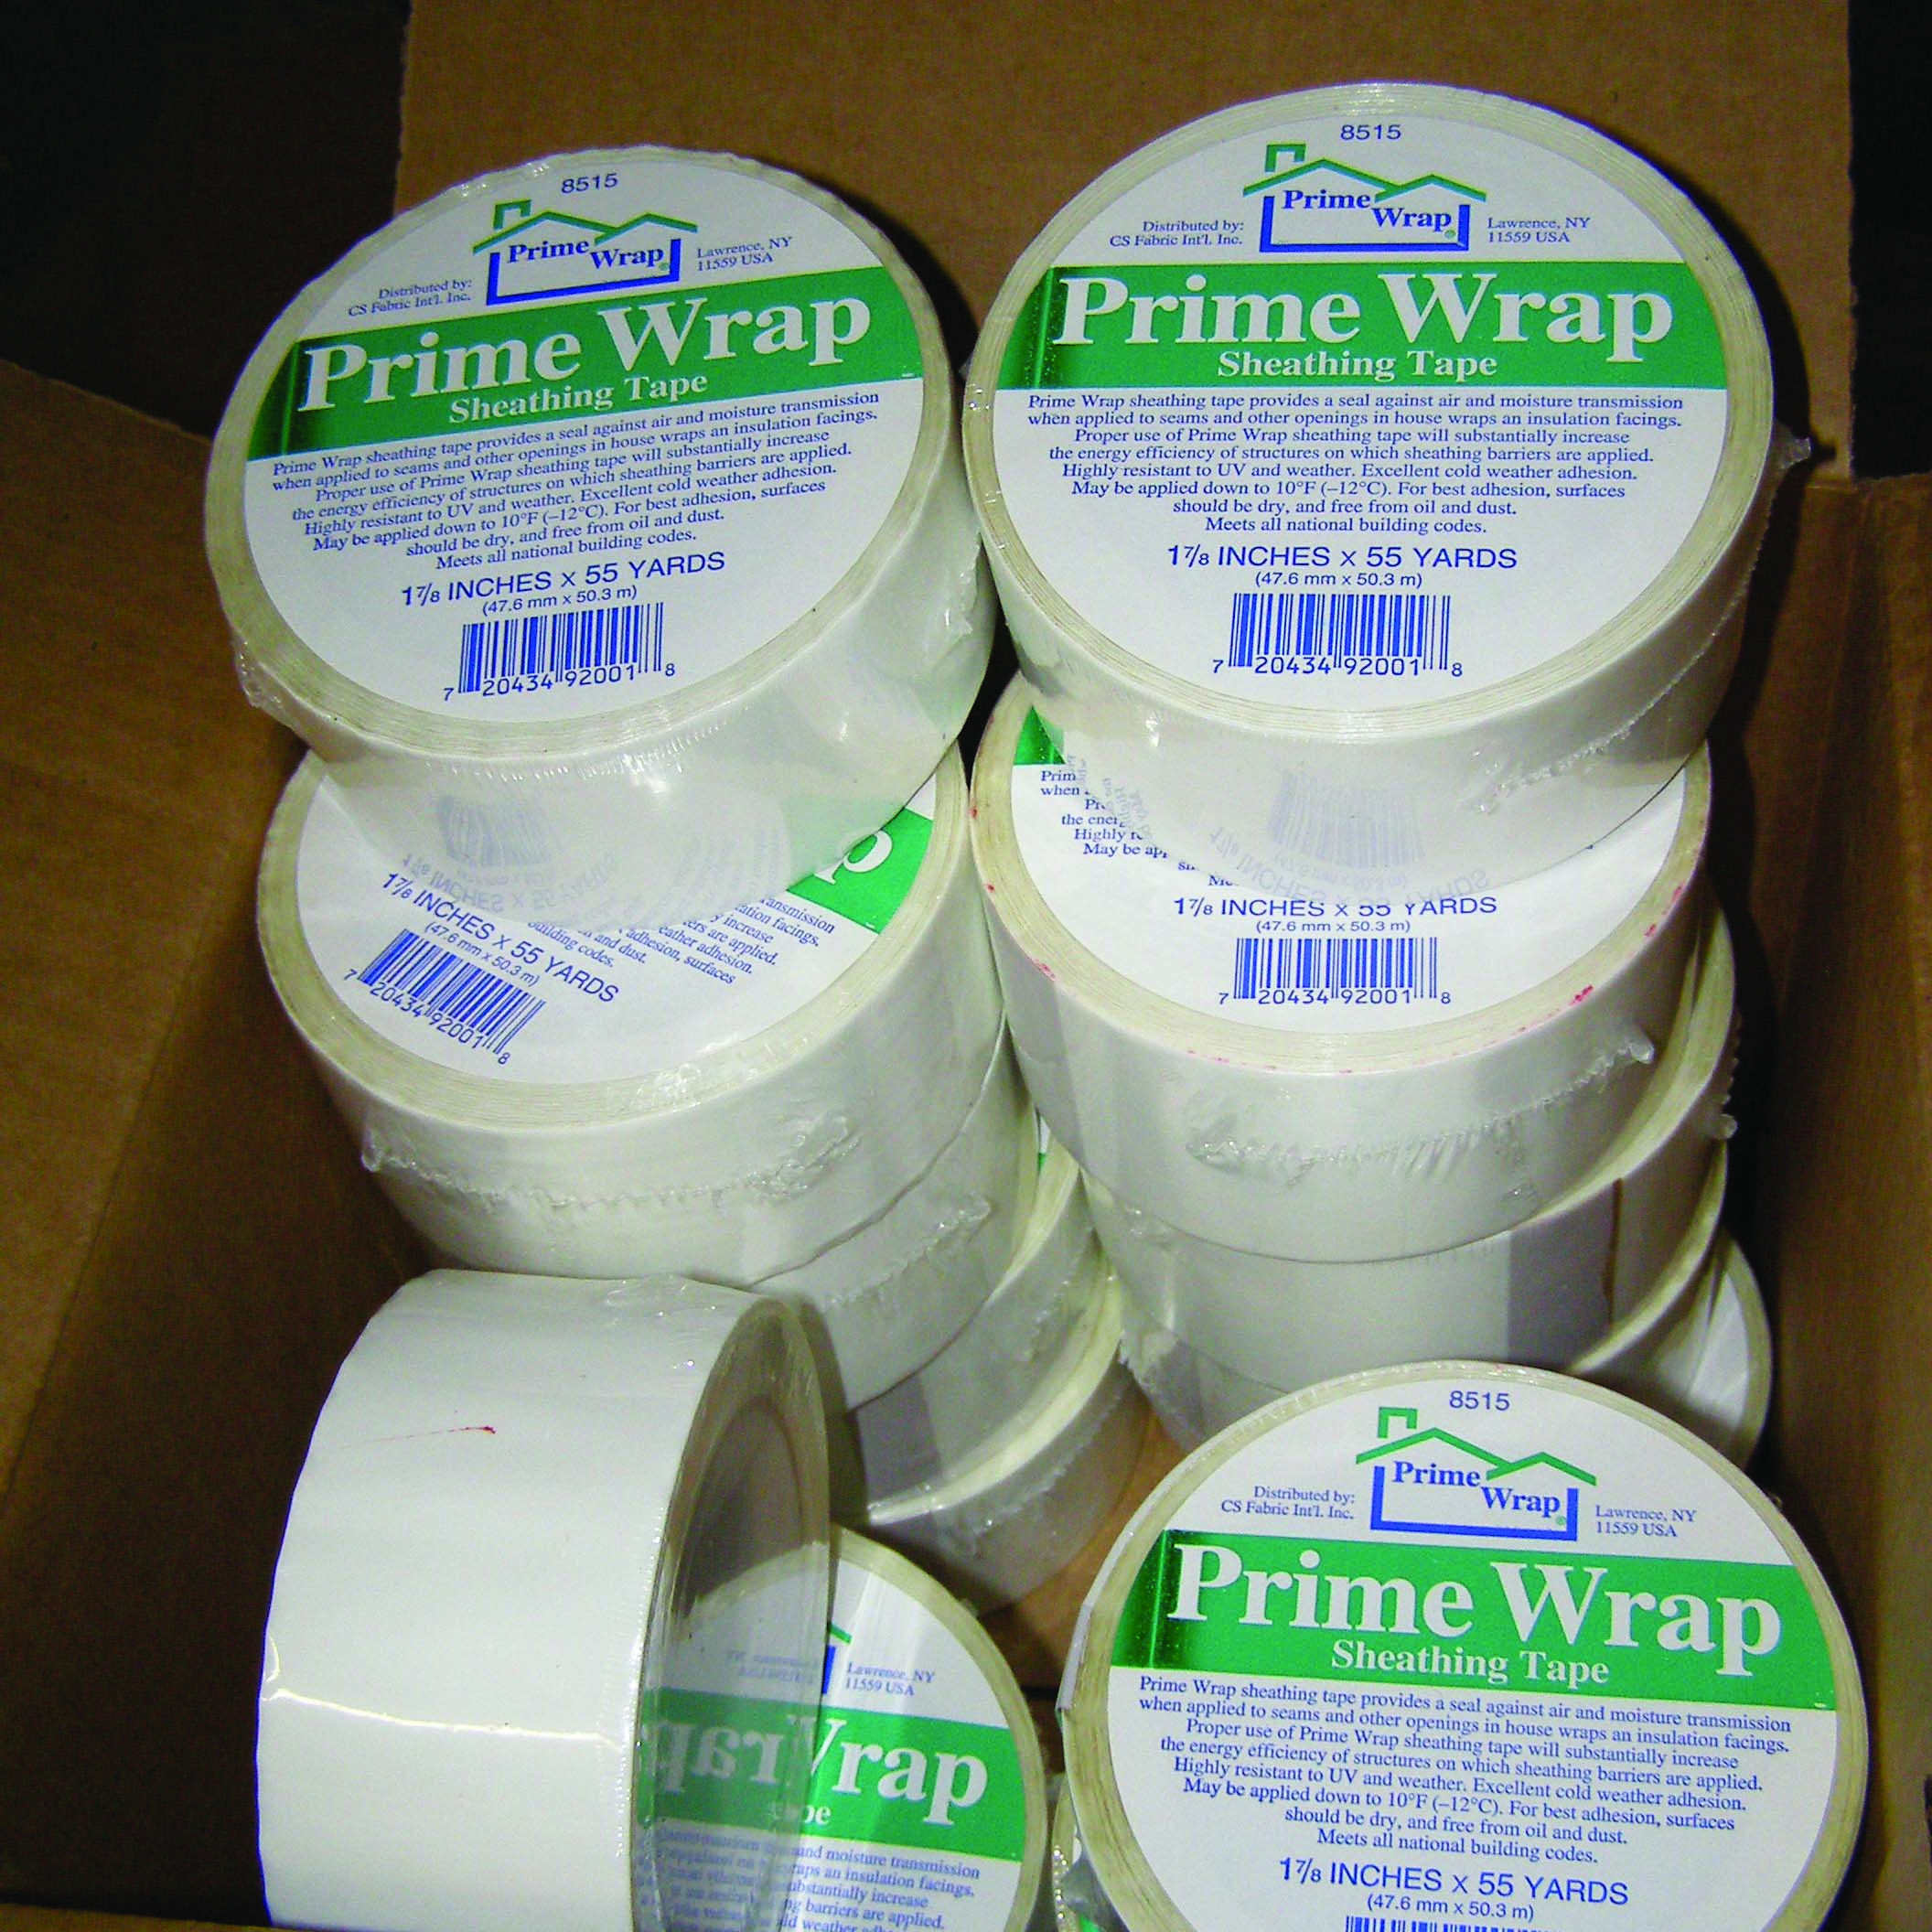 PrimeWrap Sheathing Tape